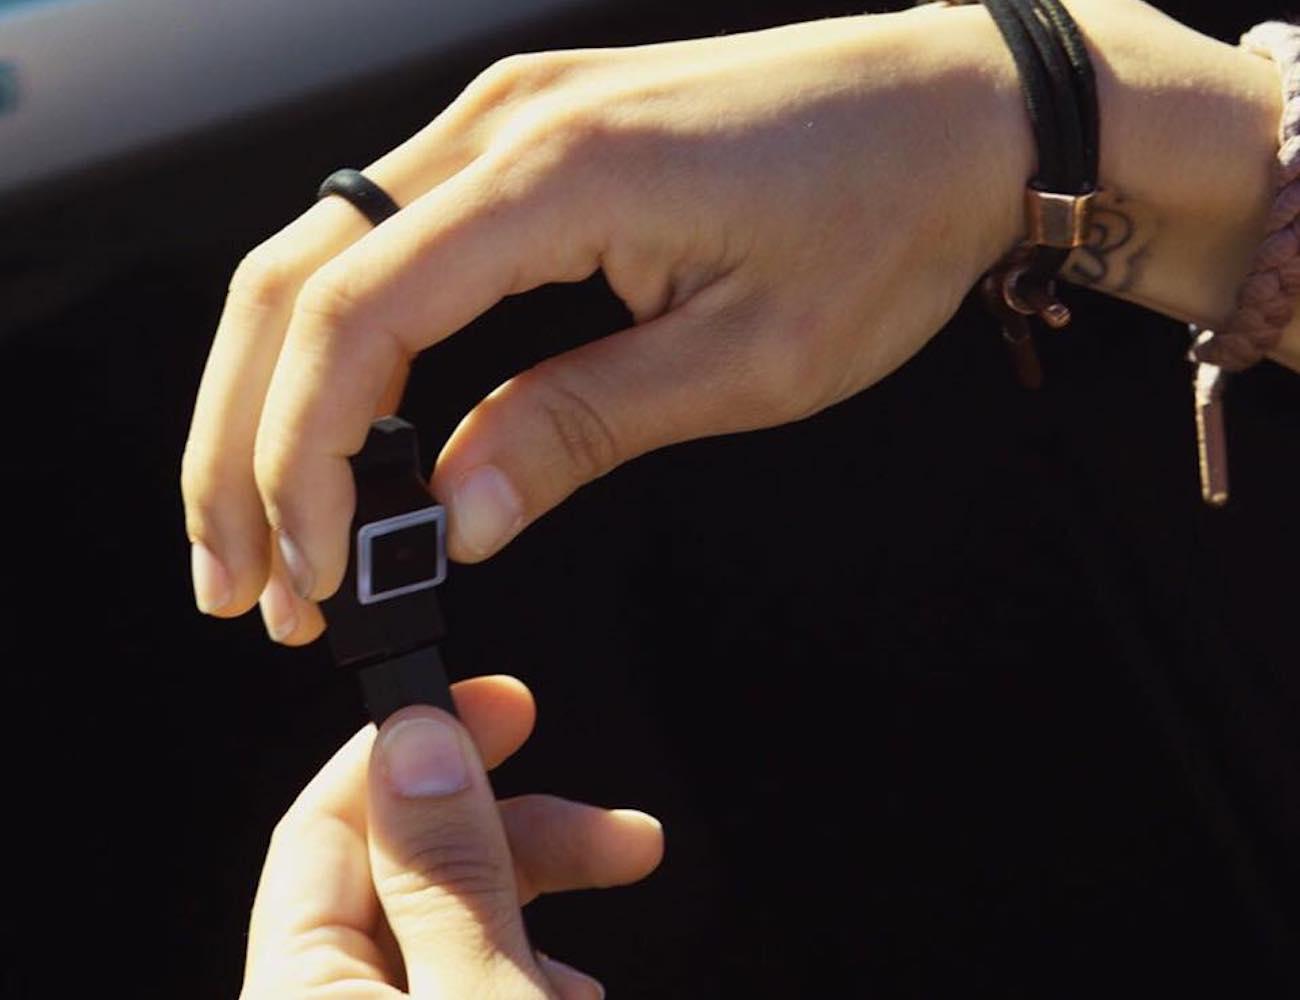 OPKIXOne Tiny Wearable Video Camera